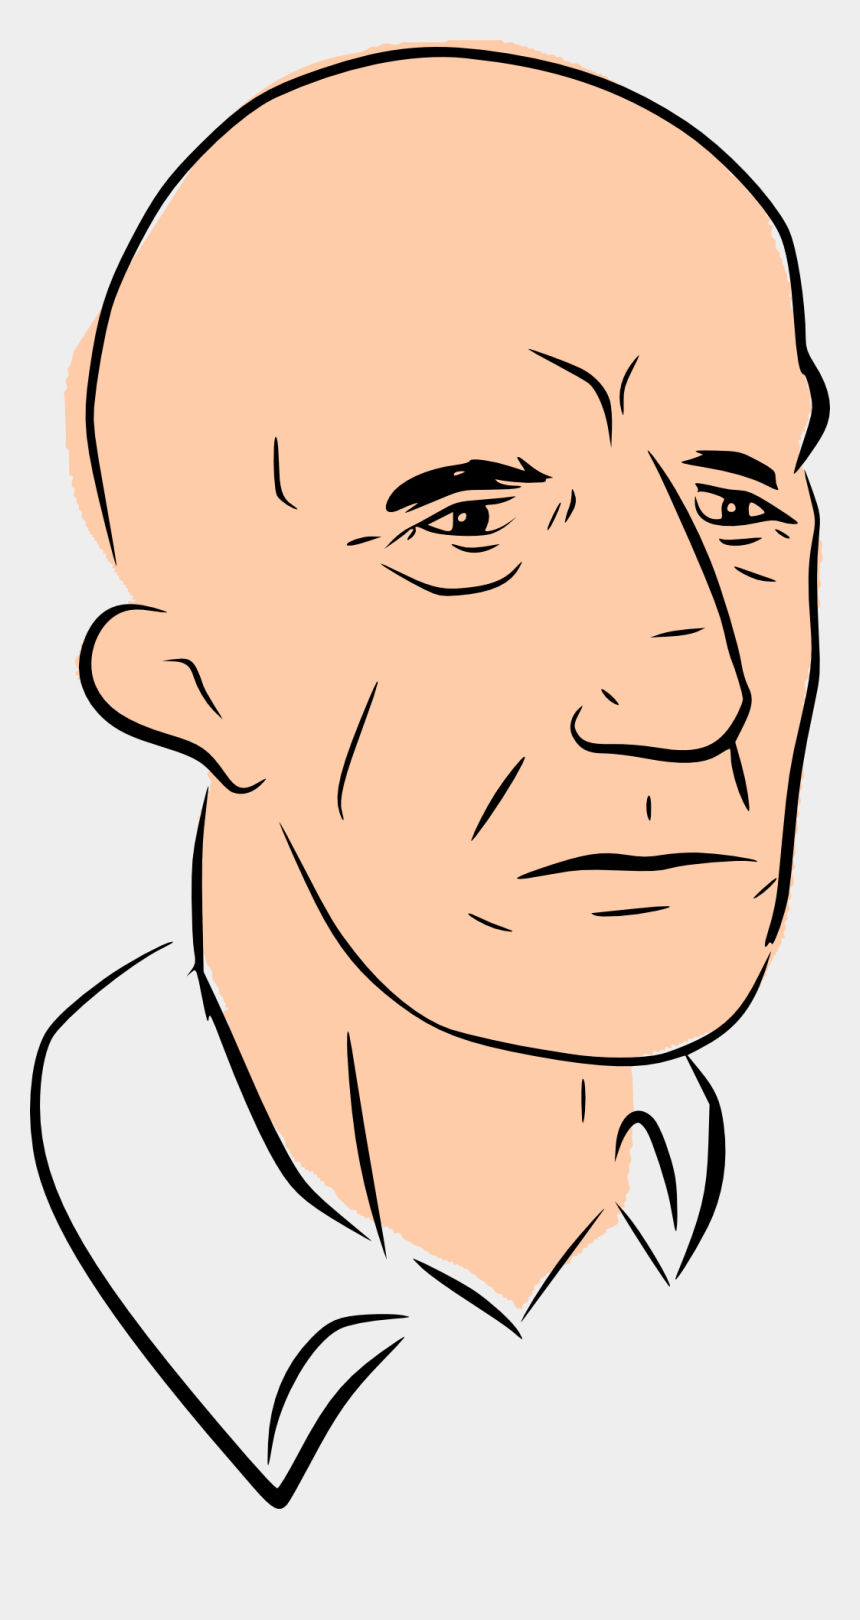 bald head clipart, Cartoons - Bald Head Man Clipart